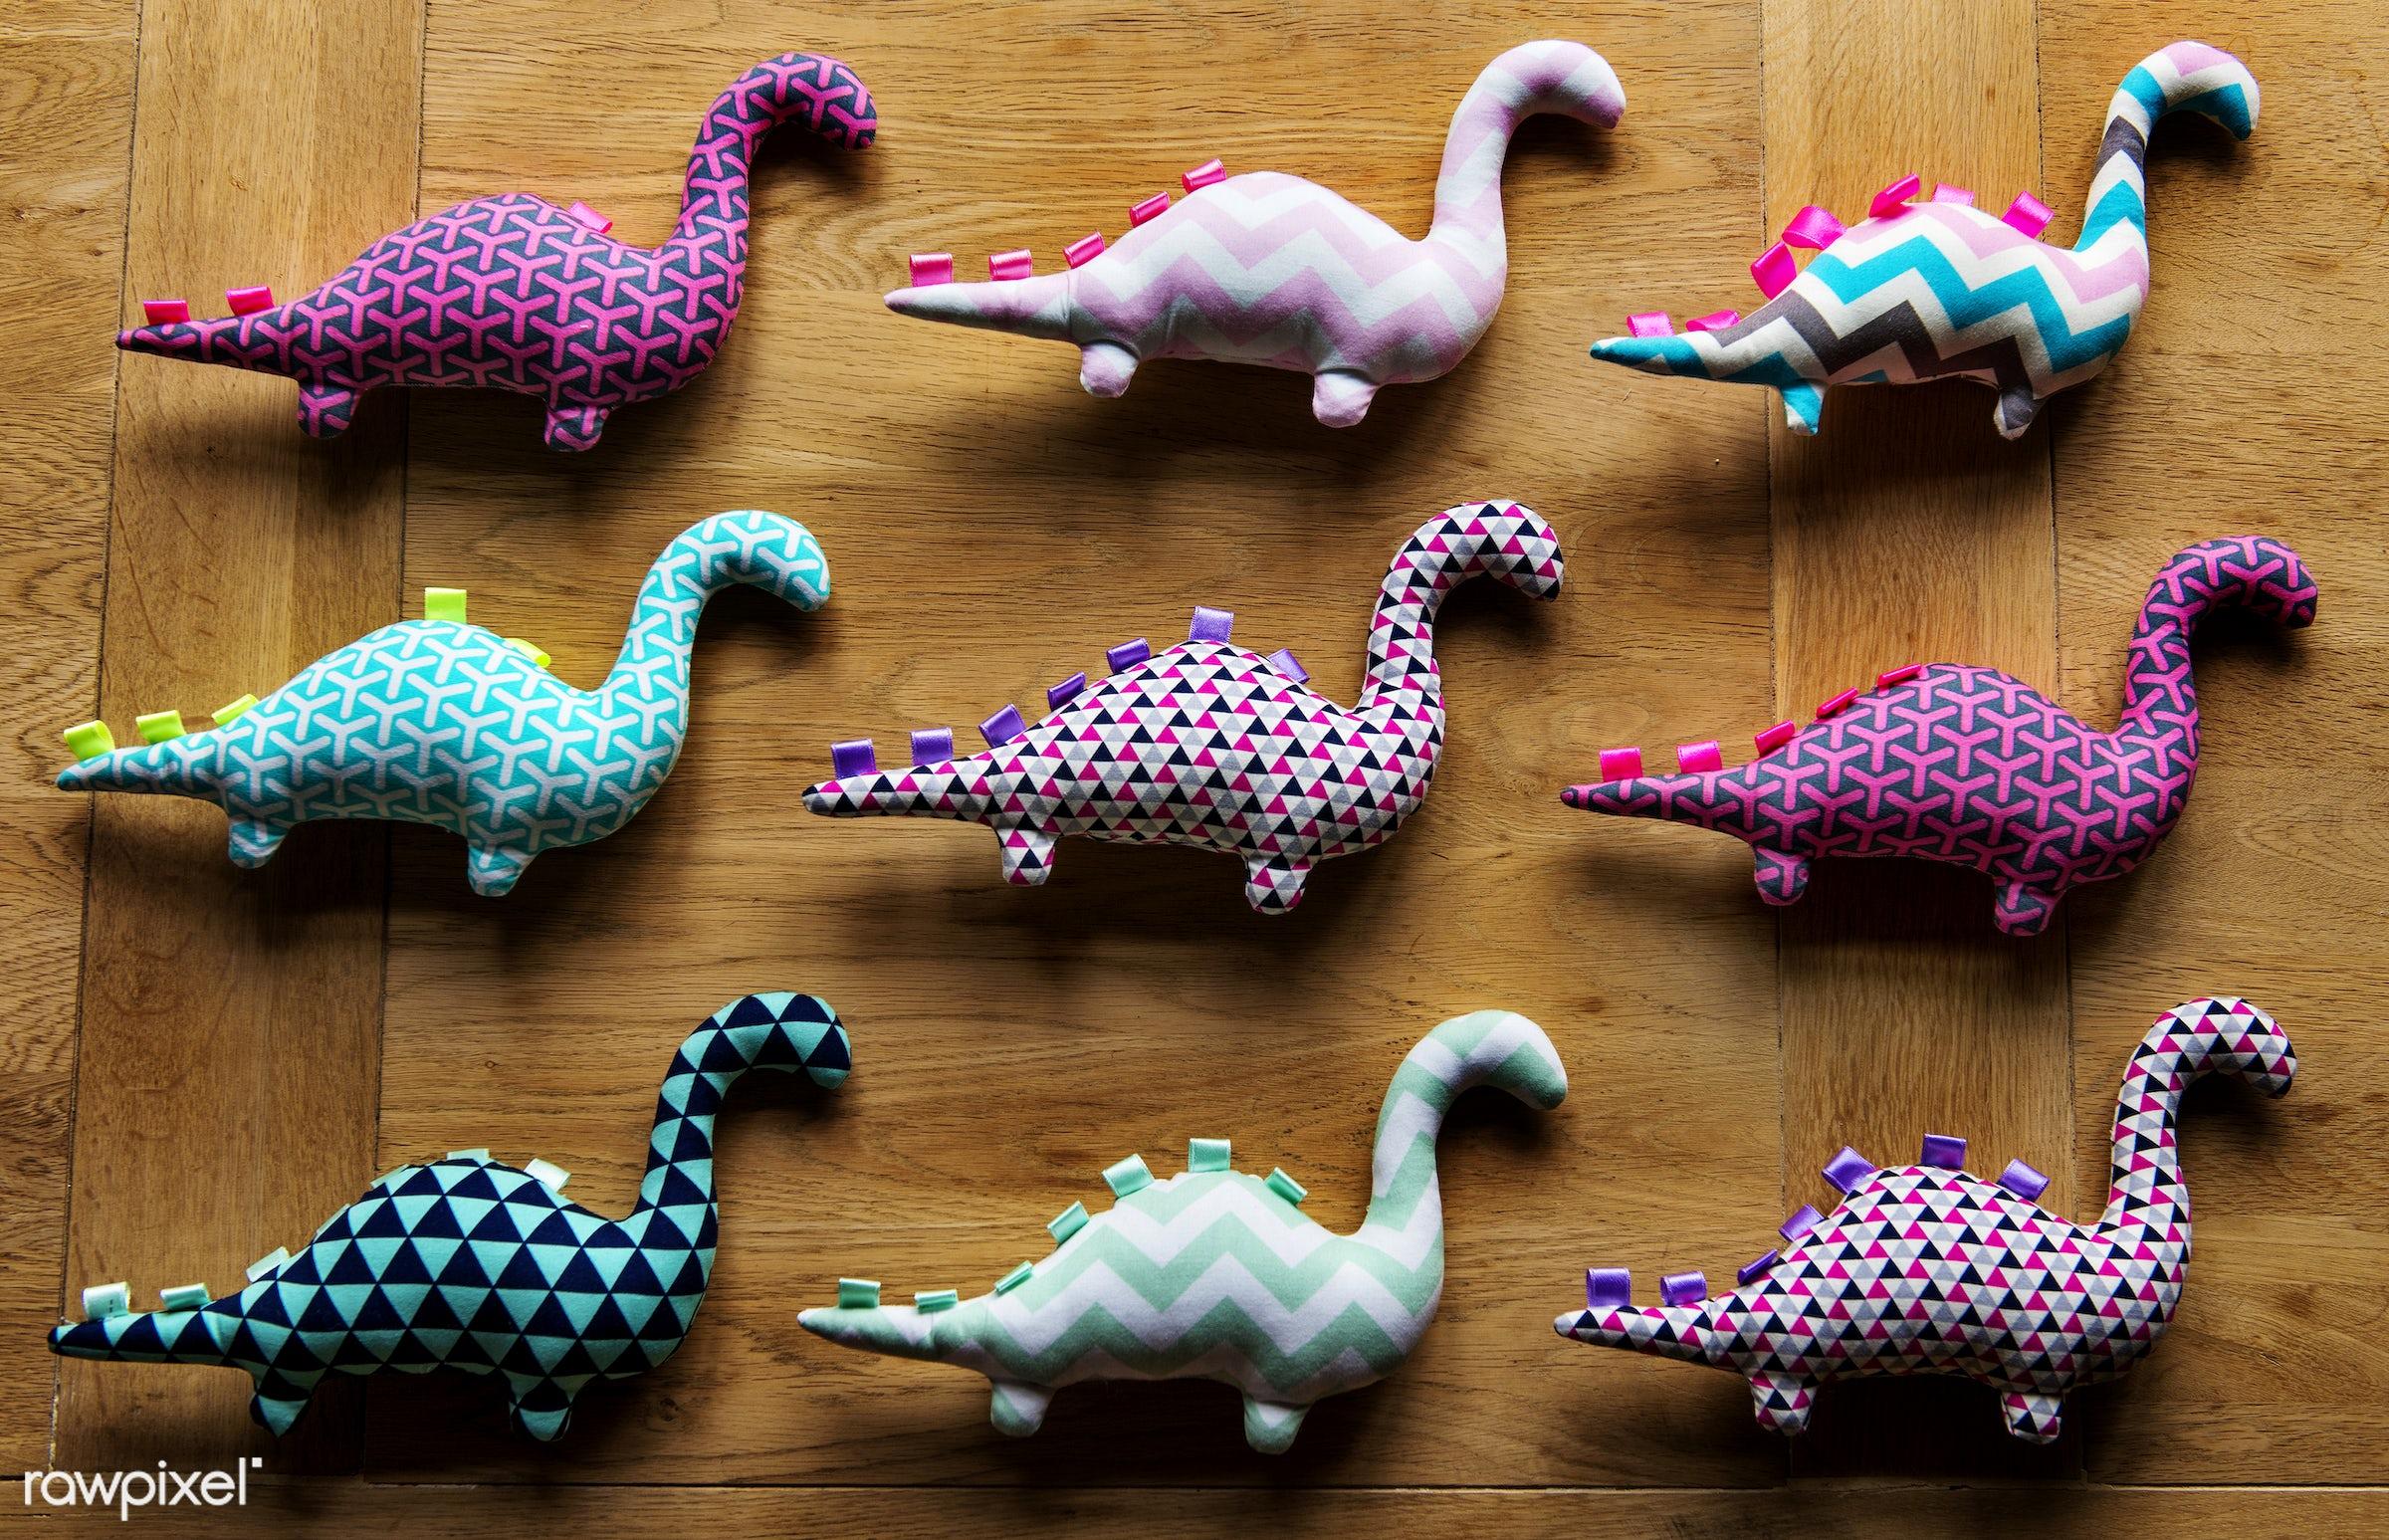 nobody, handicraft, homemade, handiwork, diy, accessory, toy, thread, handwork, animal, handcraft, needlework, vintage, art...